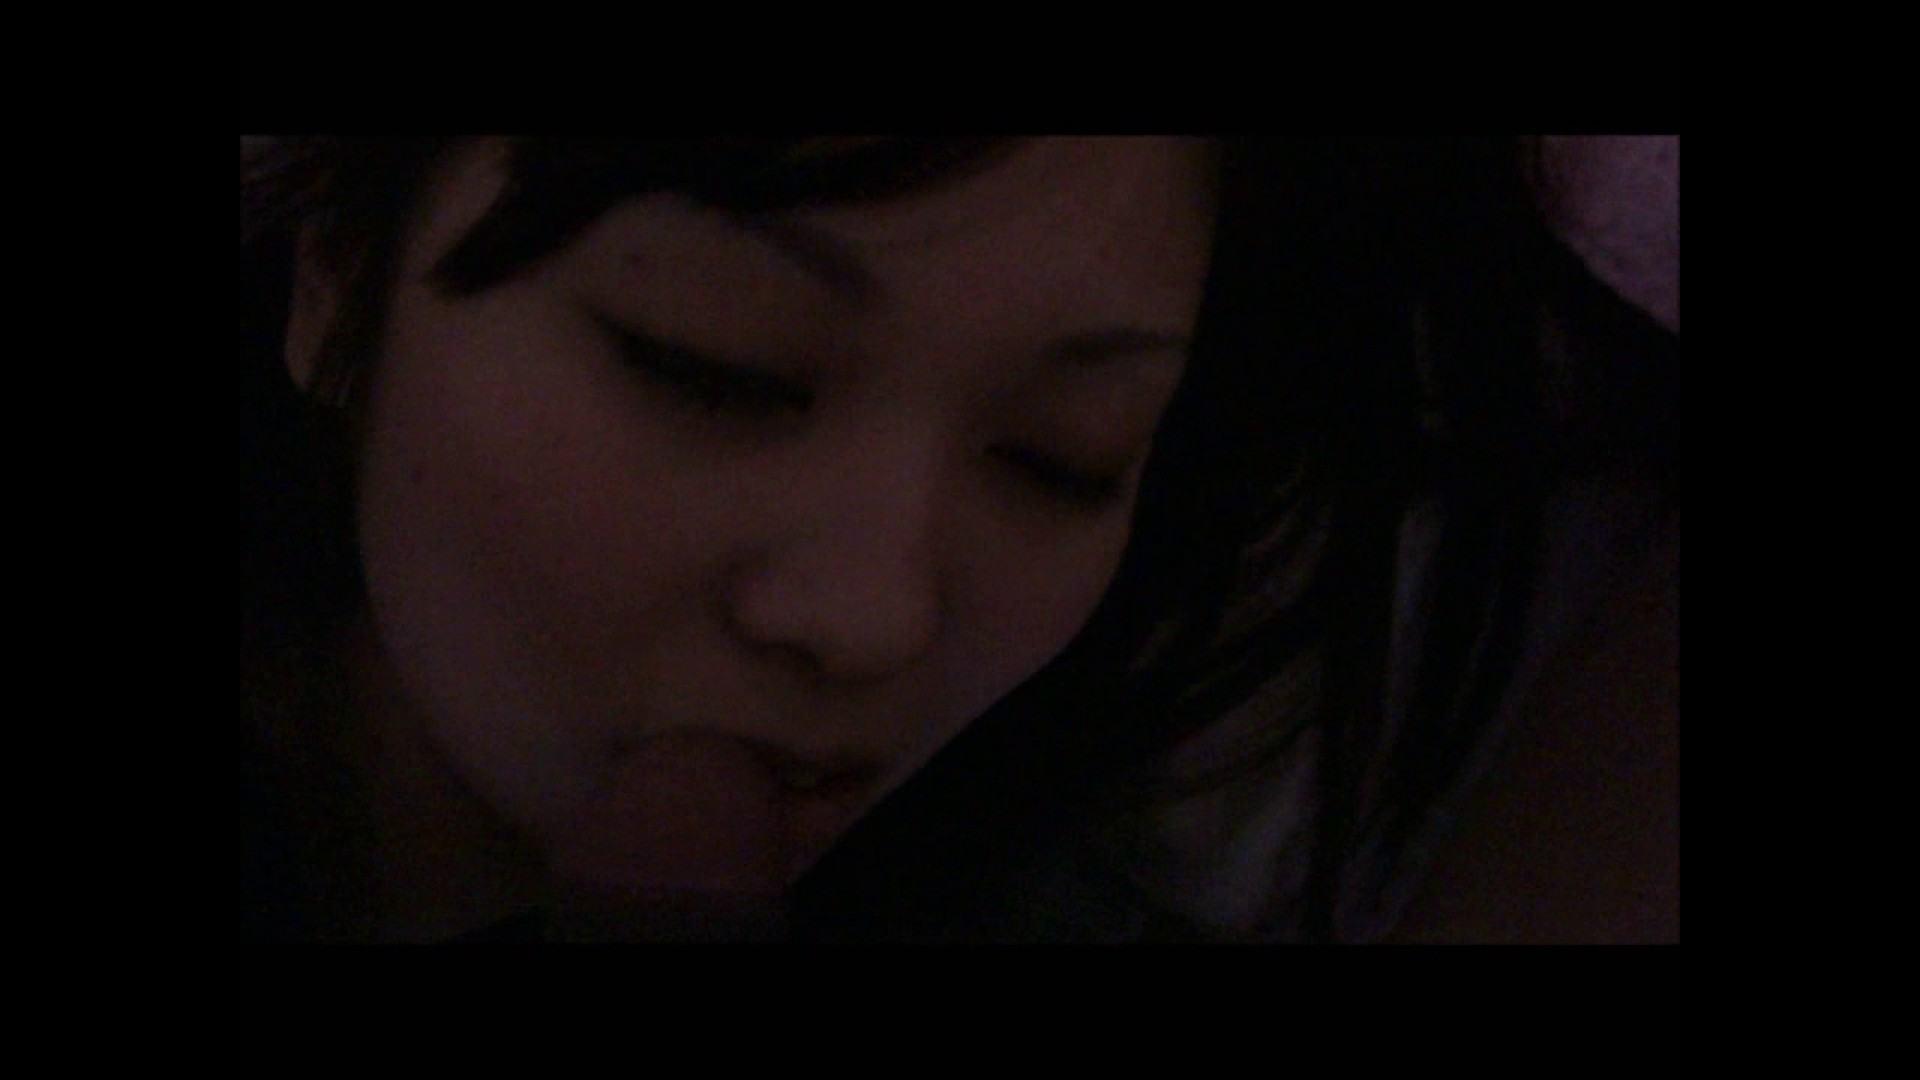 Vol.15 友人が抱く葵への感情・・・弄ばれた巨乳。 友人 アダルト動画キャプチャ 111枚 104